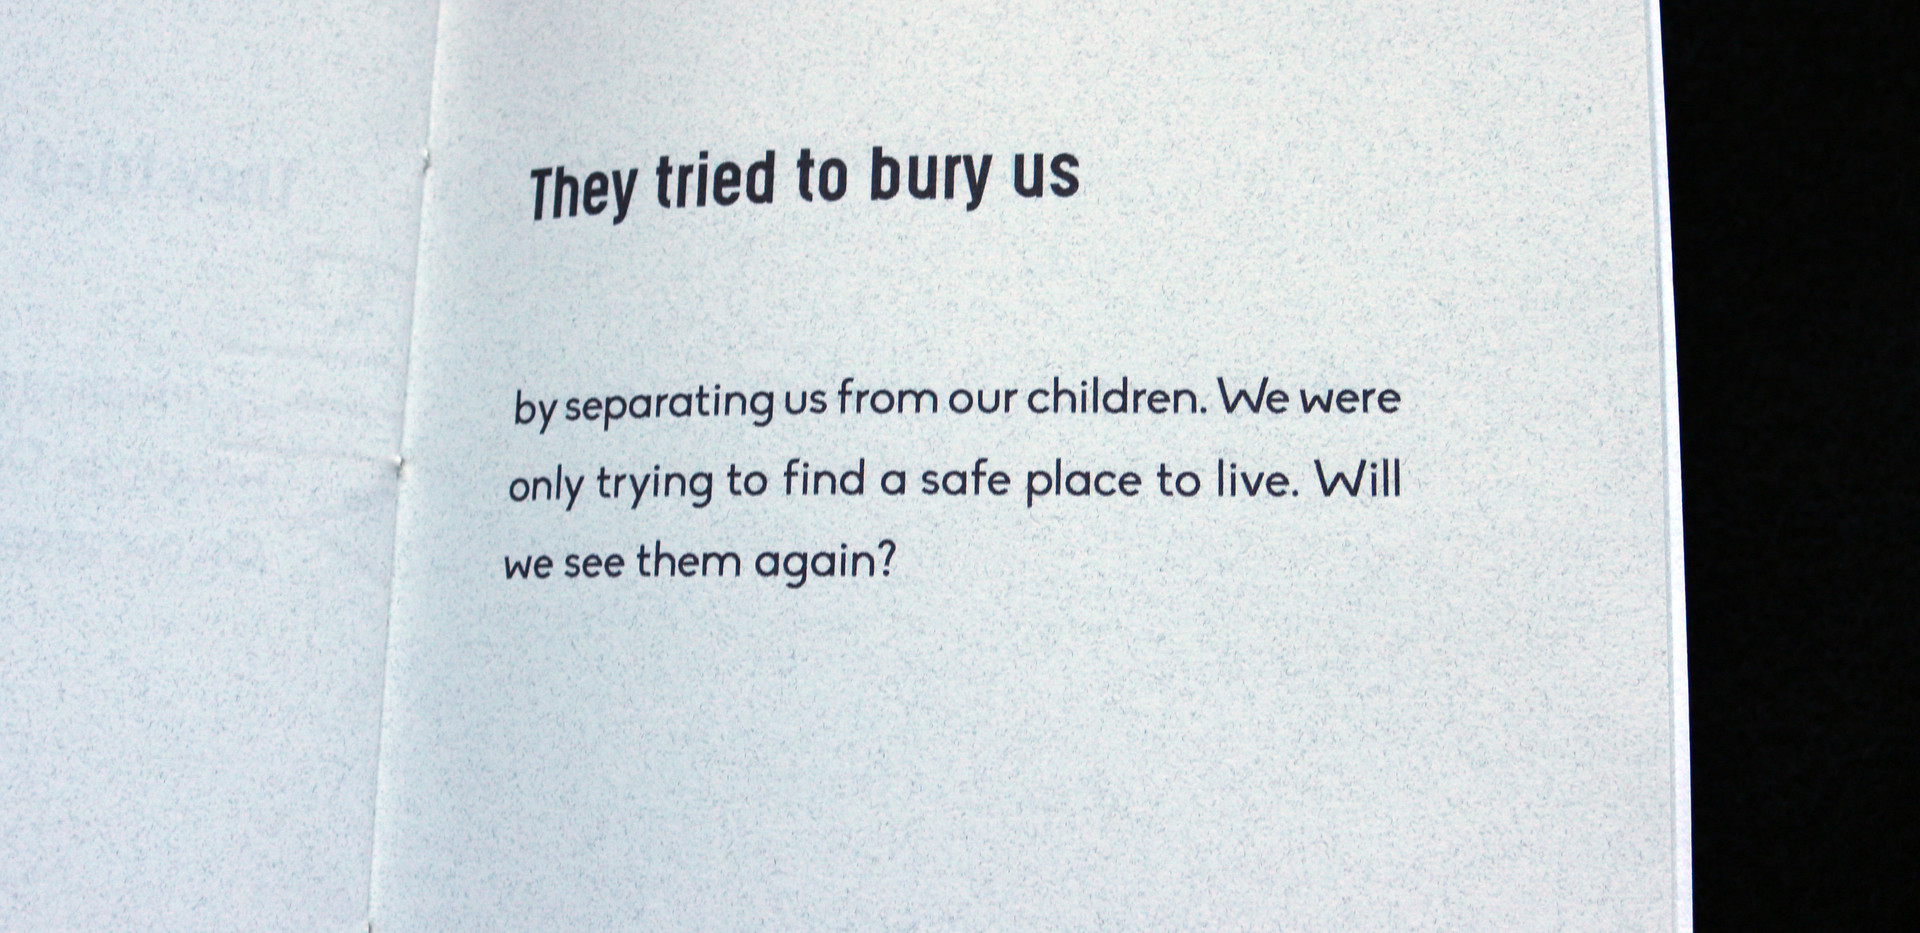 They tried children.jpg